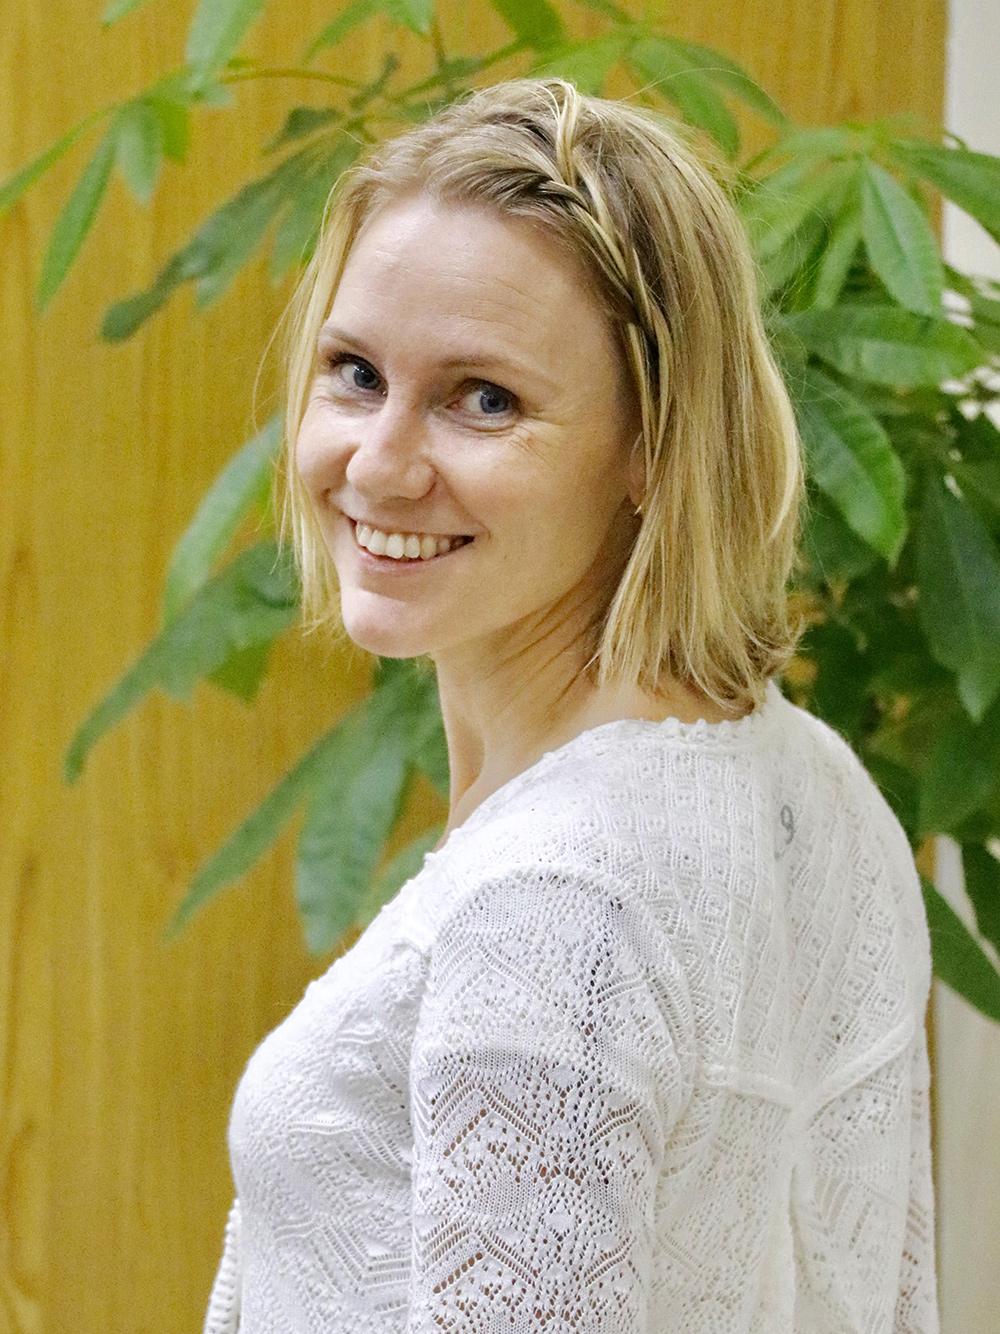 Sofie Broman